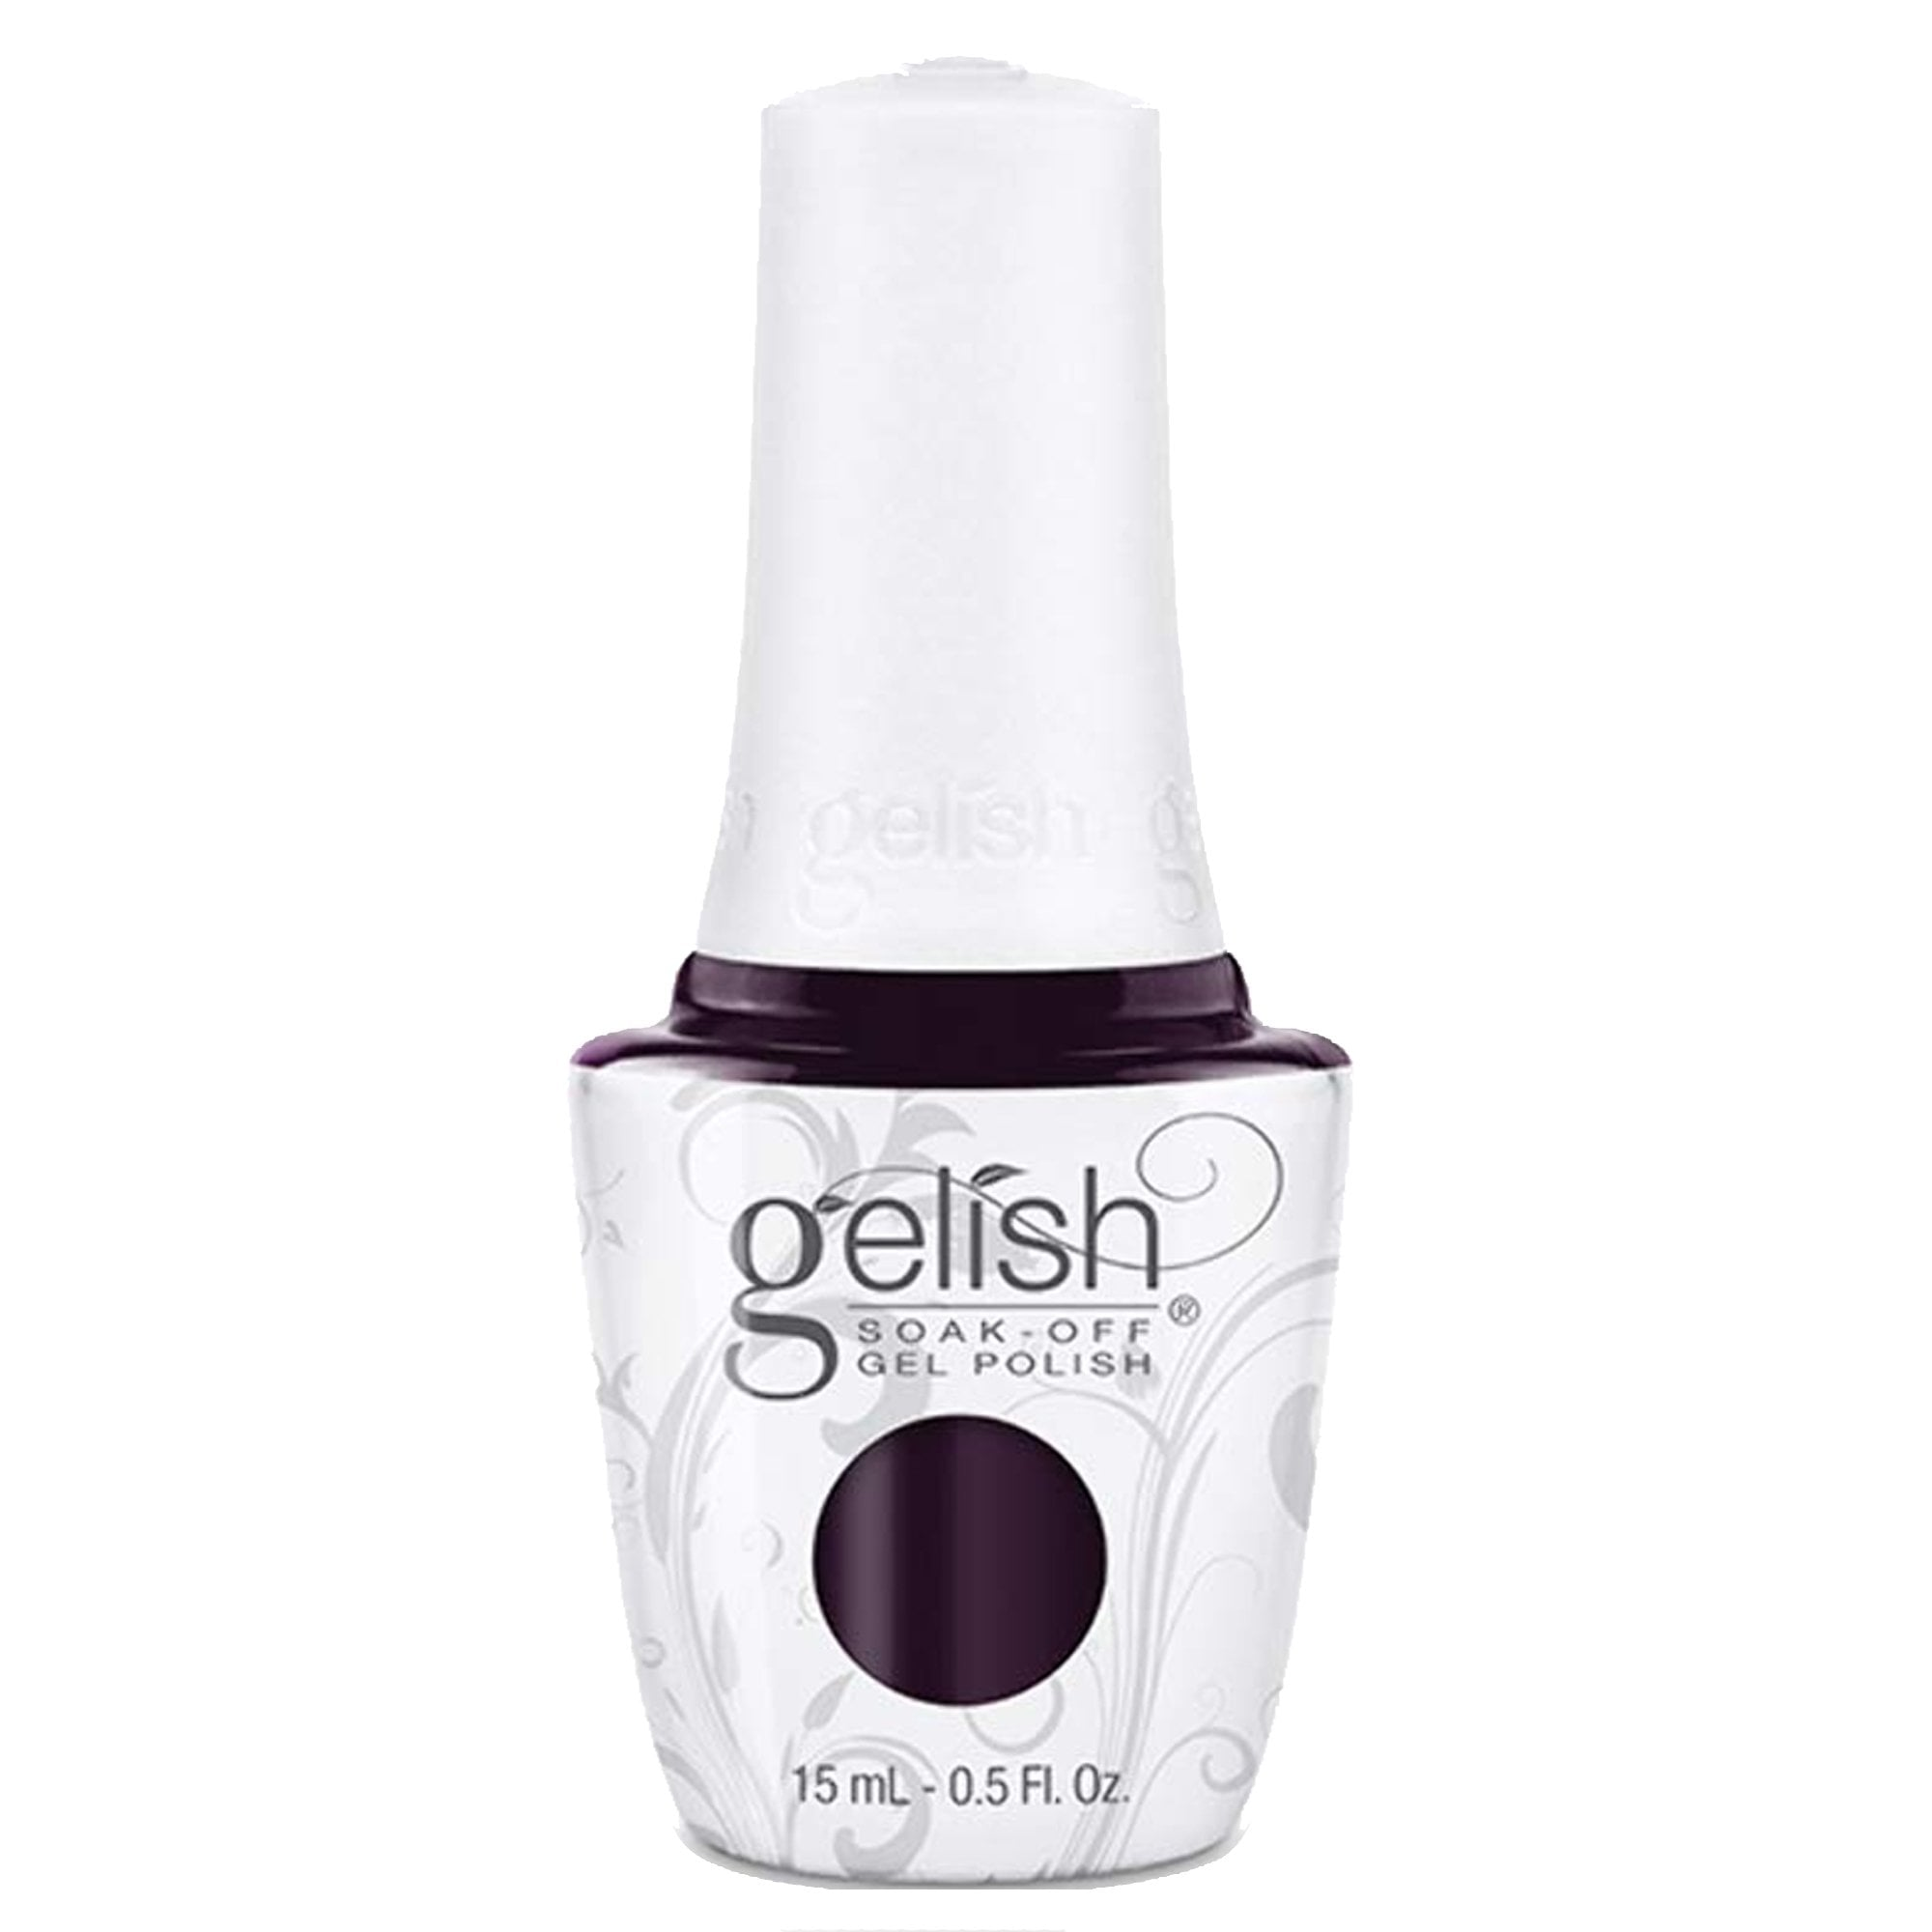 Gelish Gelish Soak-Off Gel Nail Polish - Diva 15ml (01415)